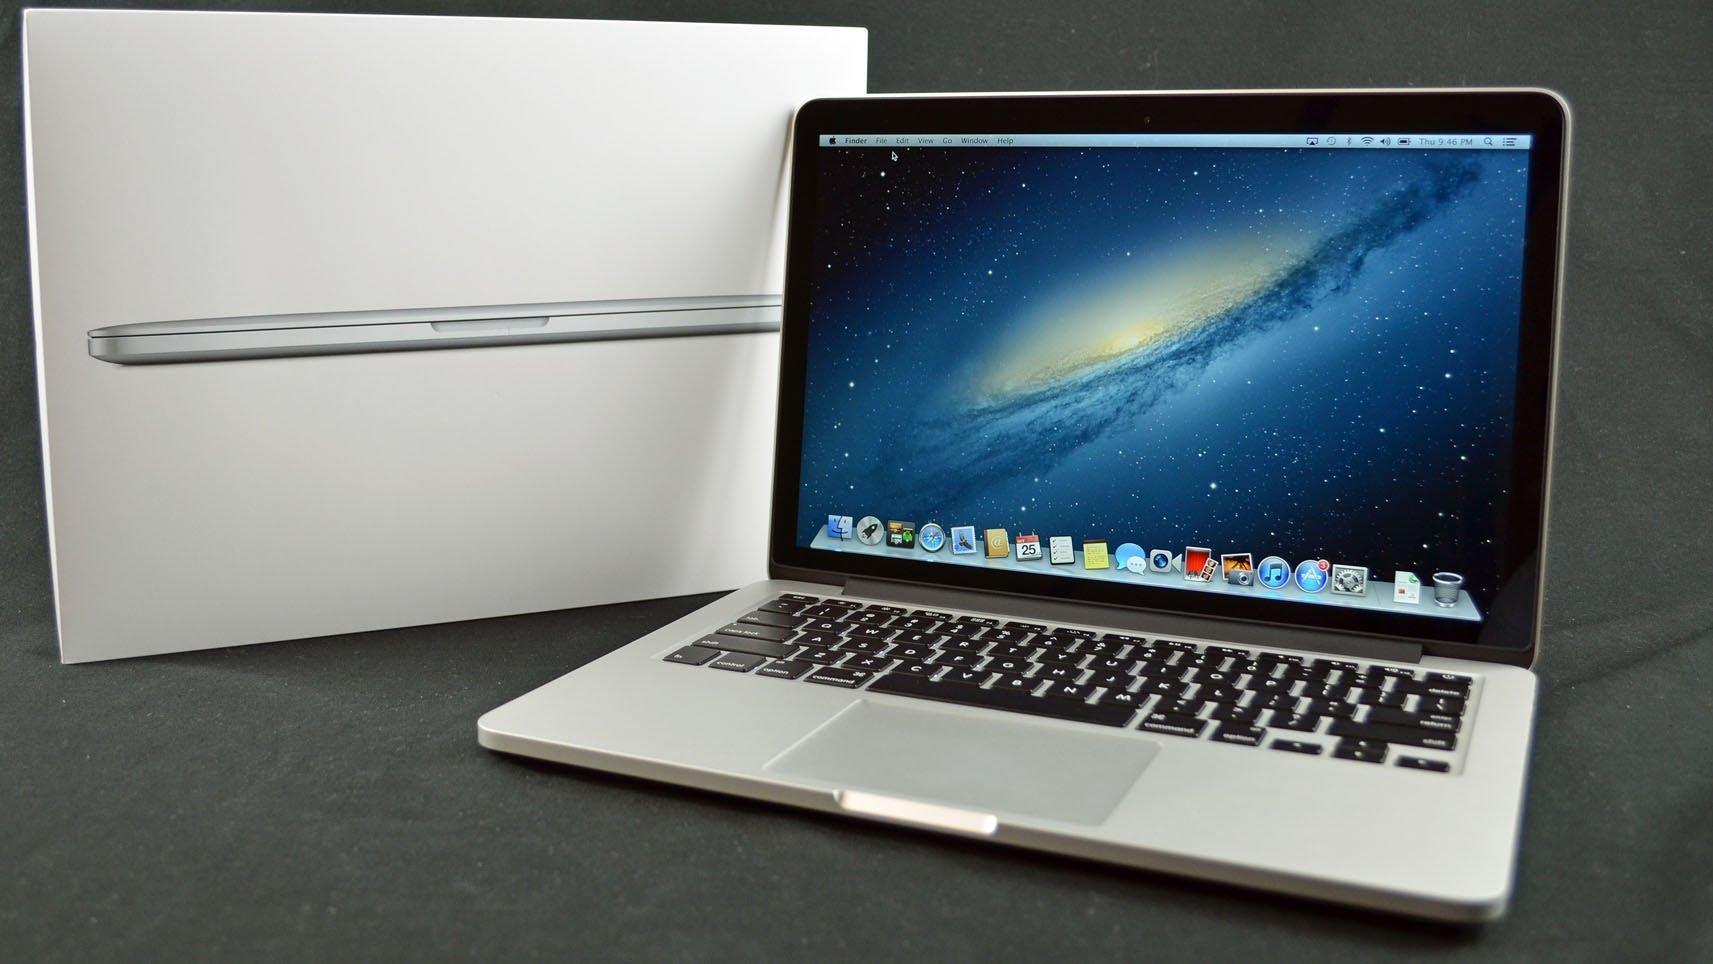 apple-macbook-pro-retina-13-inch-mid-2014-yicommobile-1411-23-yicommobile@1